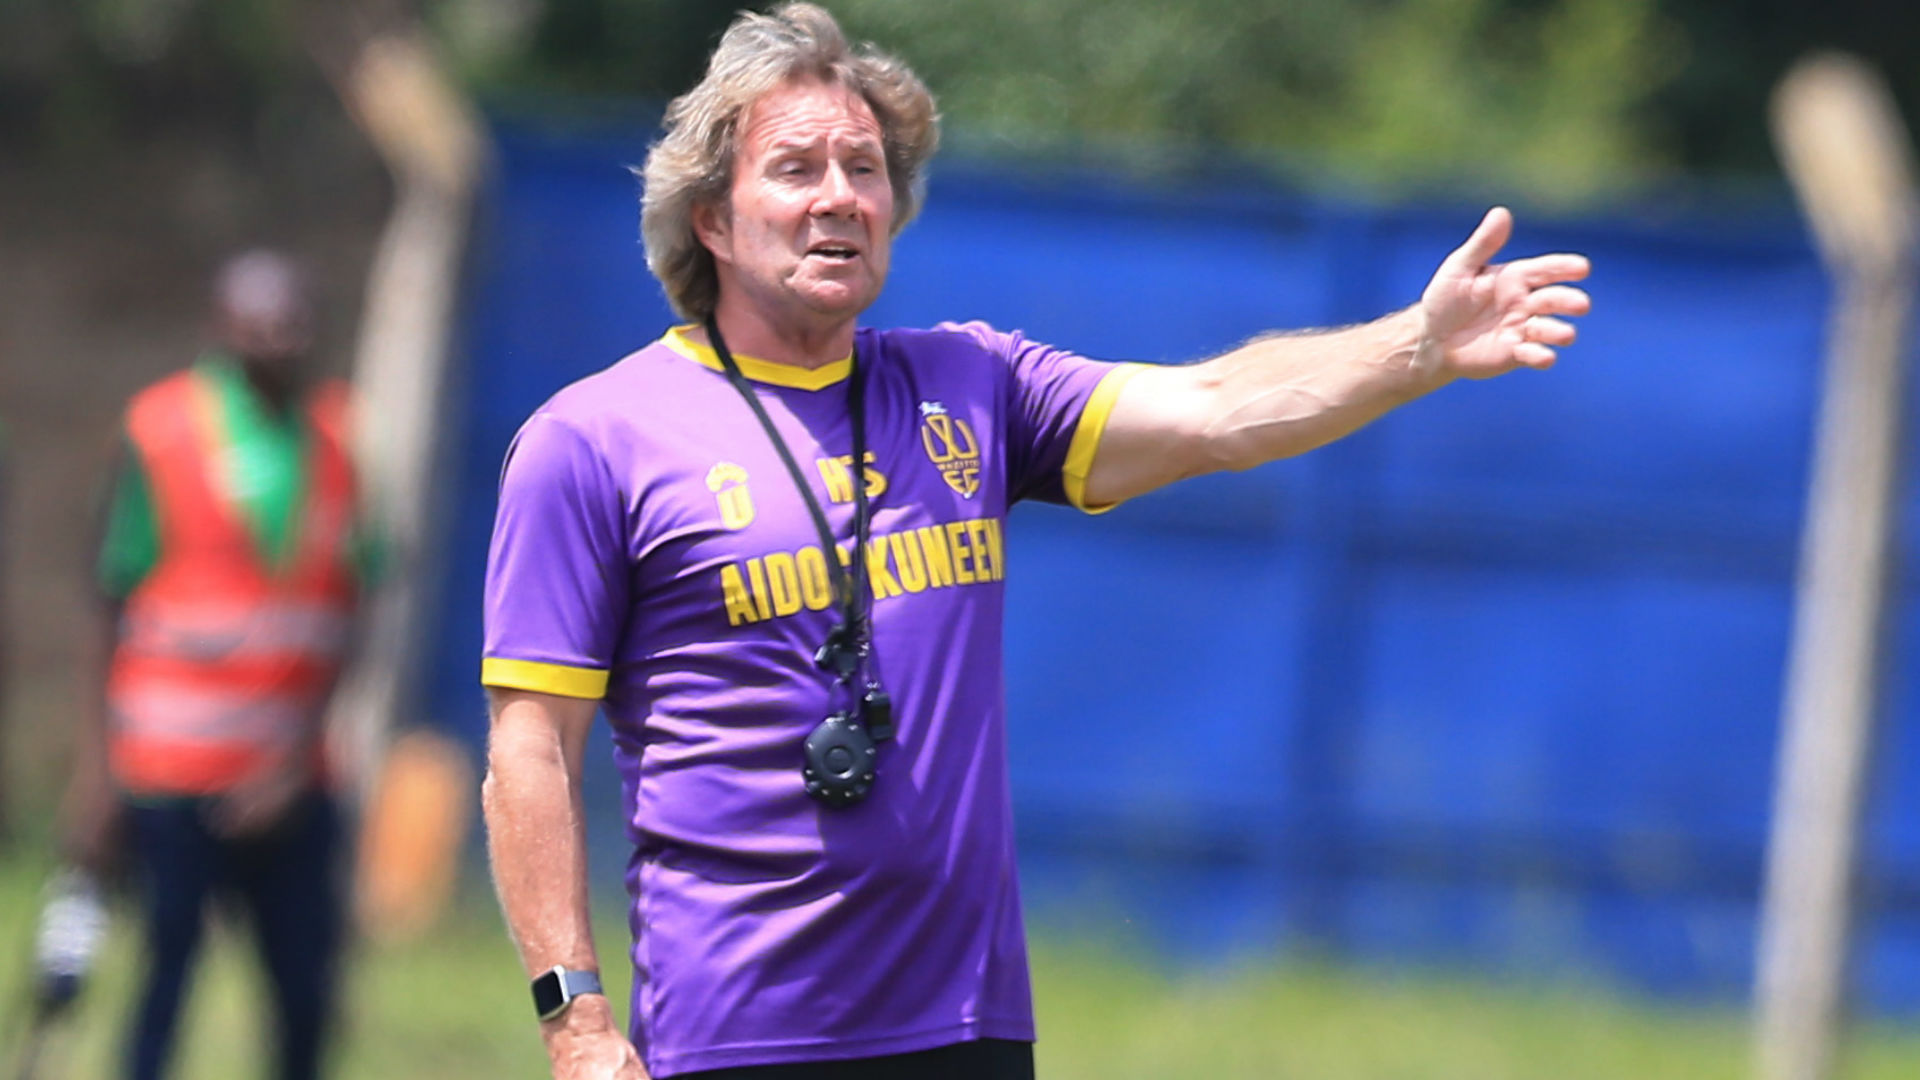 Wazito FC coach Hall reveals dissatisfaction despite huge victory ...